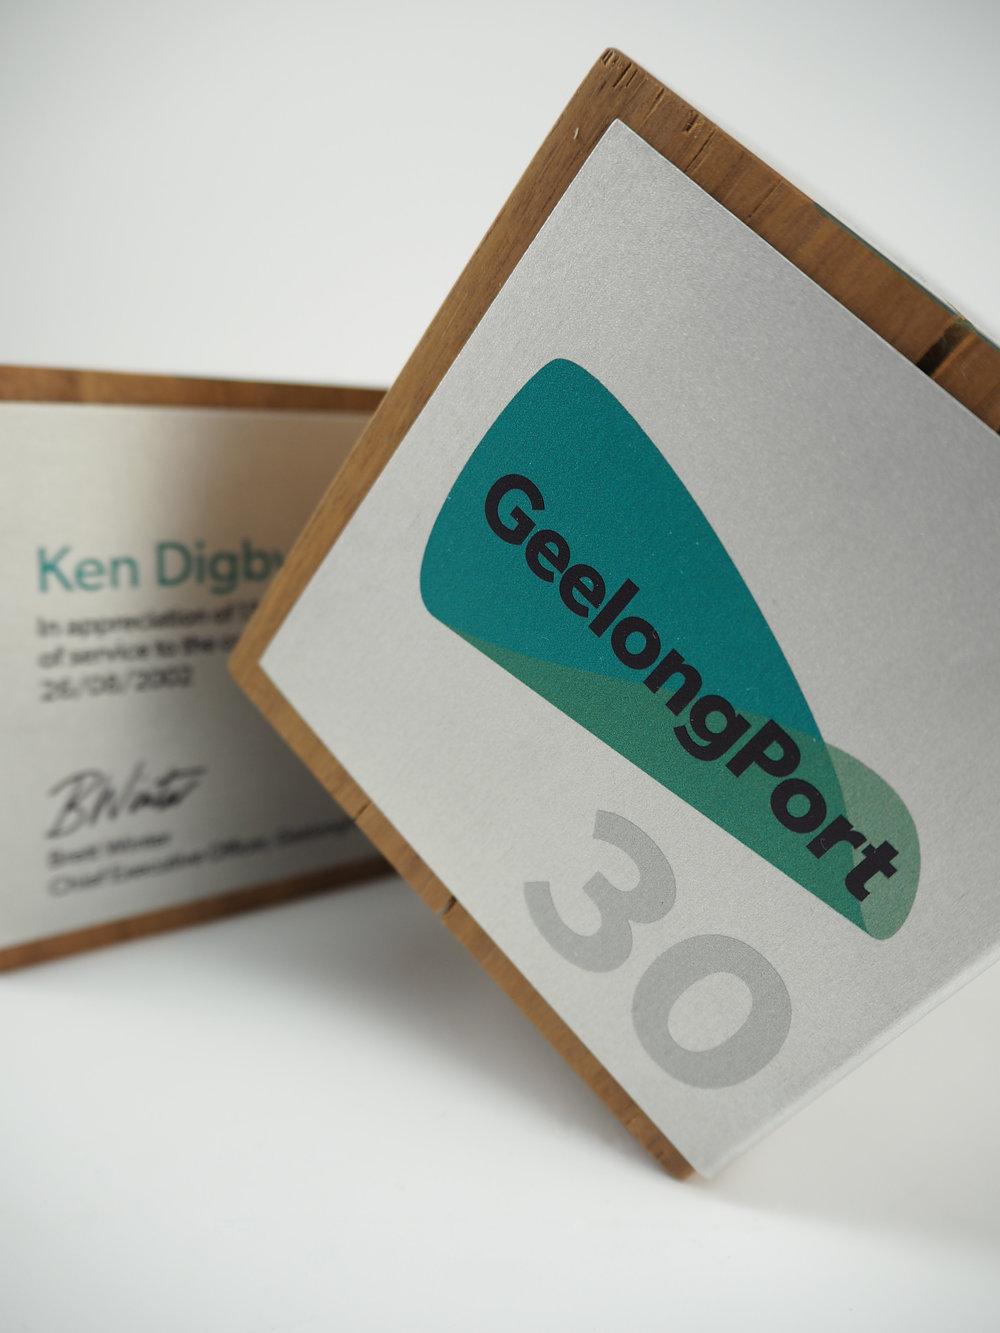 geelong-port-awards-reclaimed-timber-eco-aluminium-trophy-05.jpg